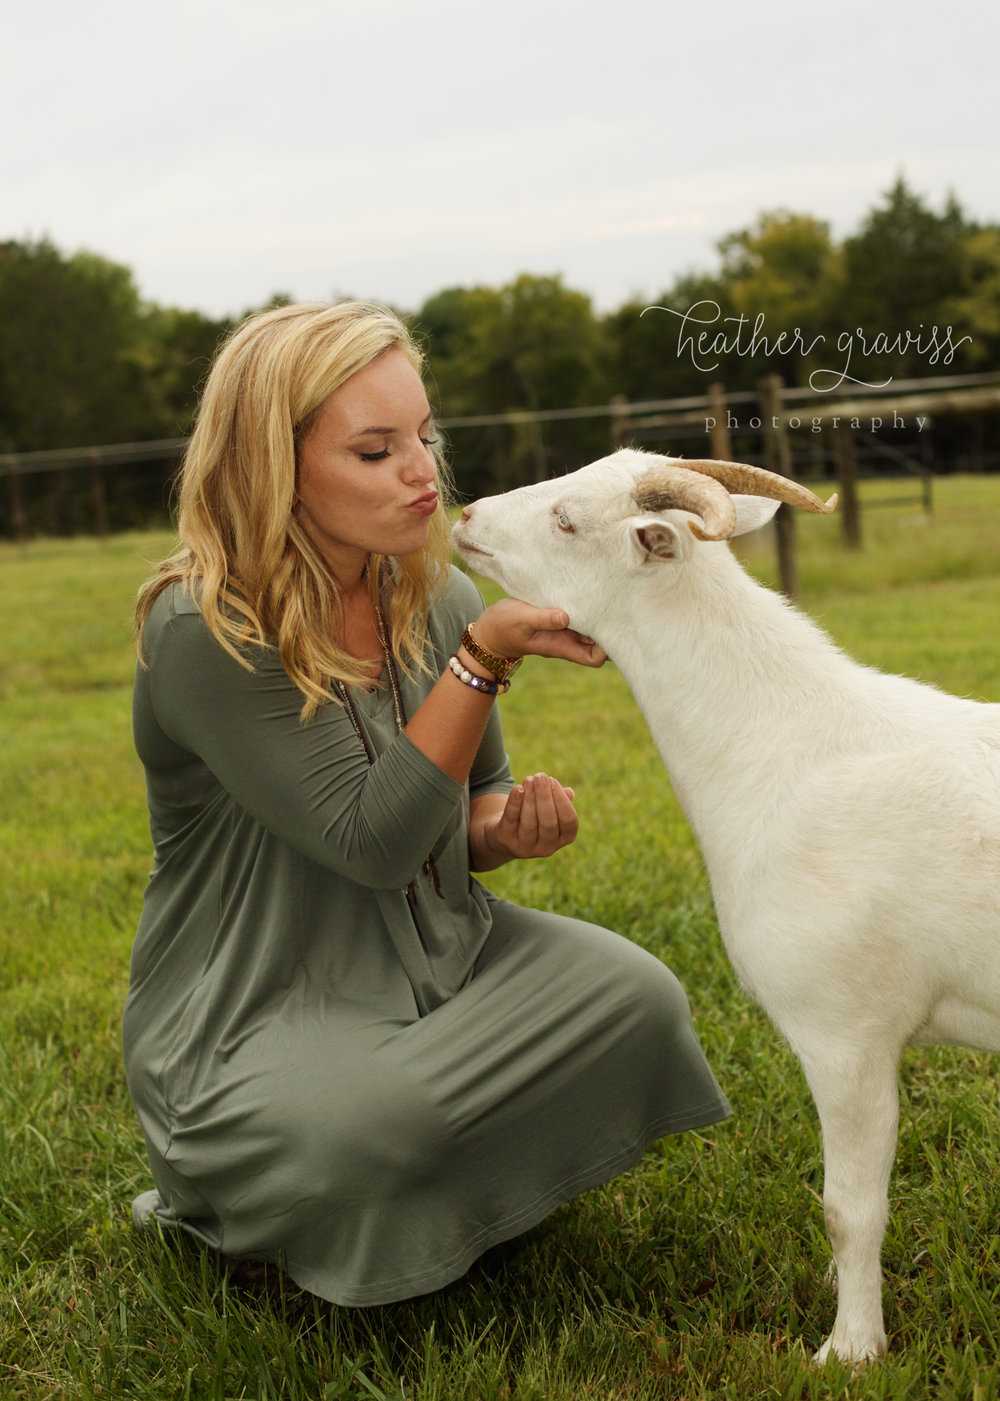 lebanon tn senior kissing goat